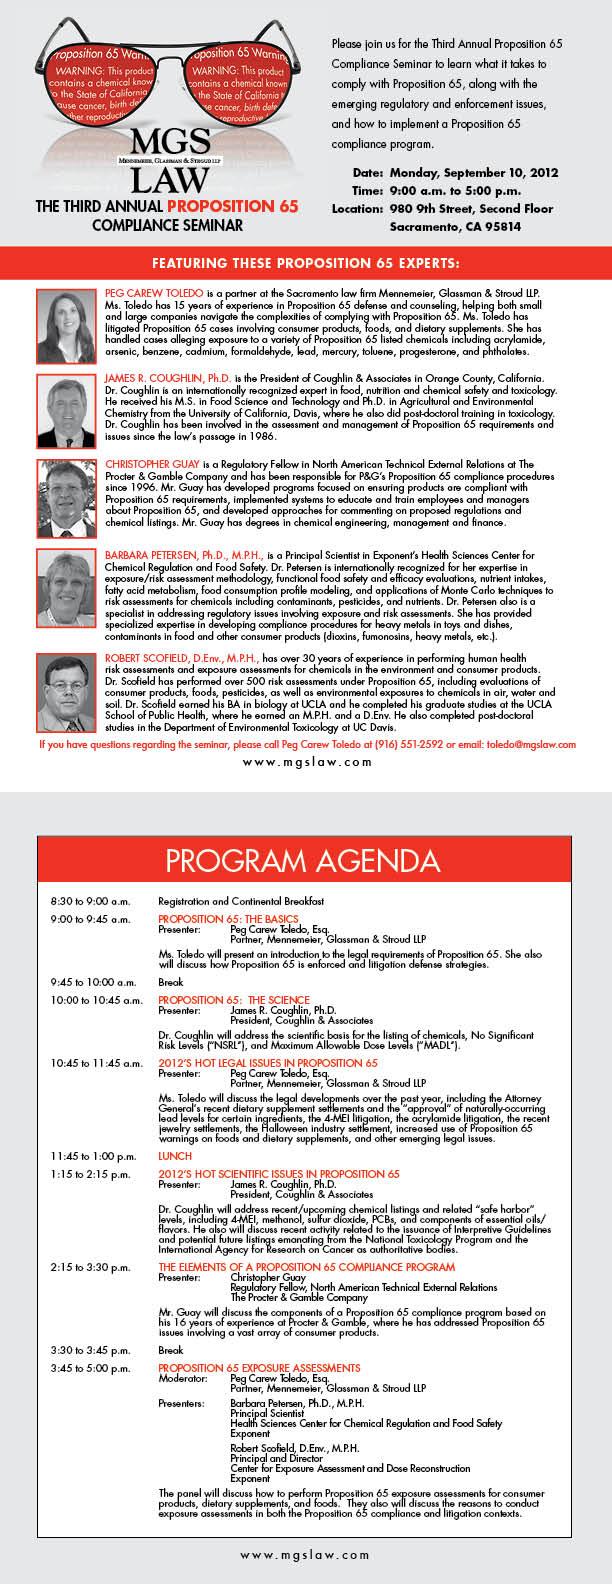 Prop 65 Seminar Bios and Program Agenda